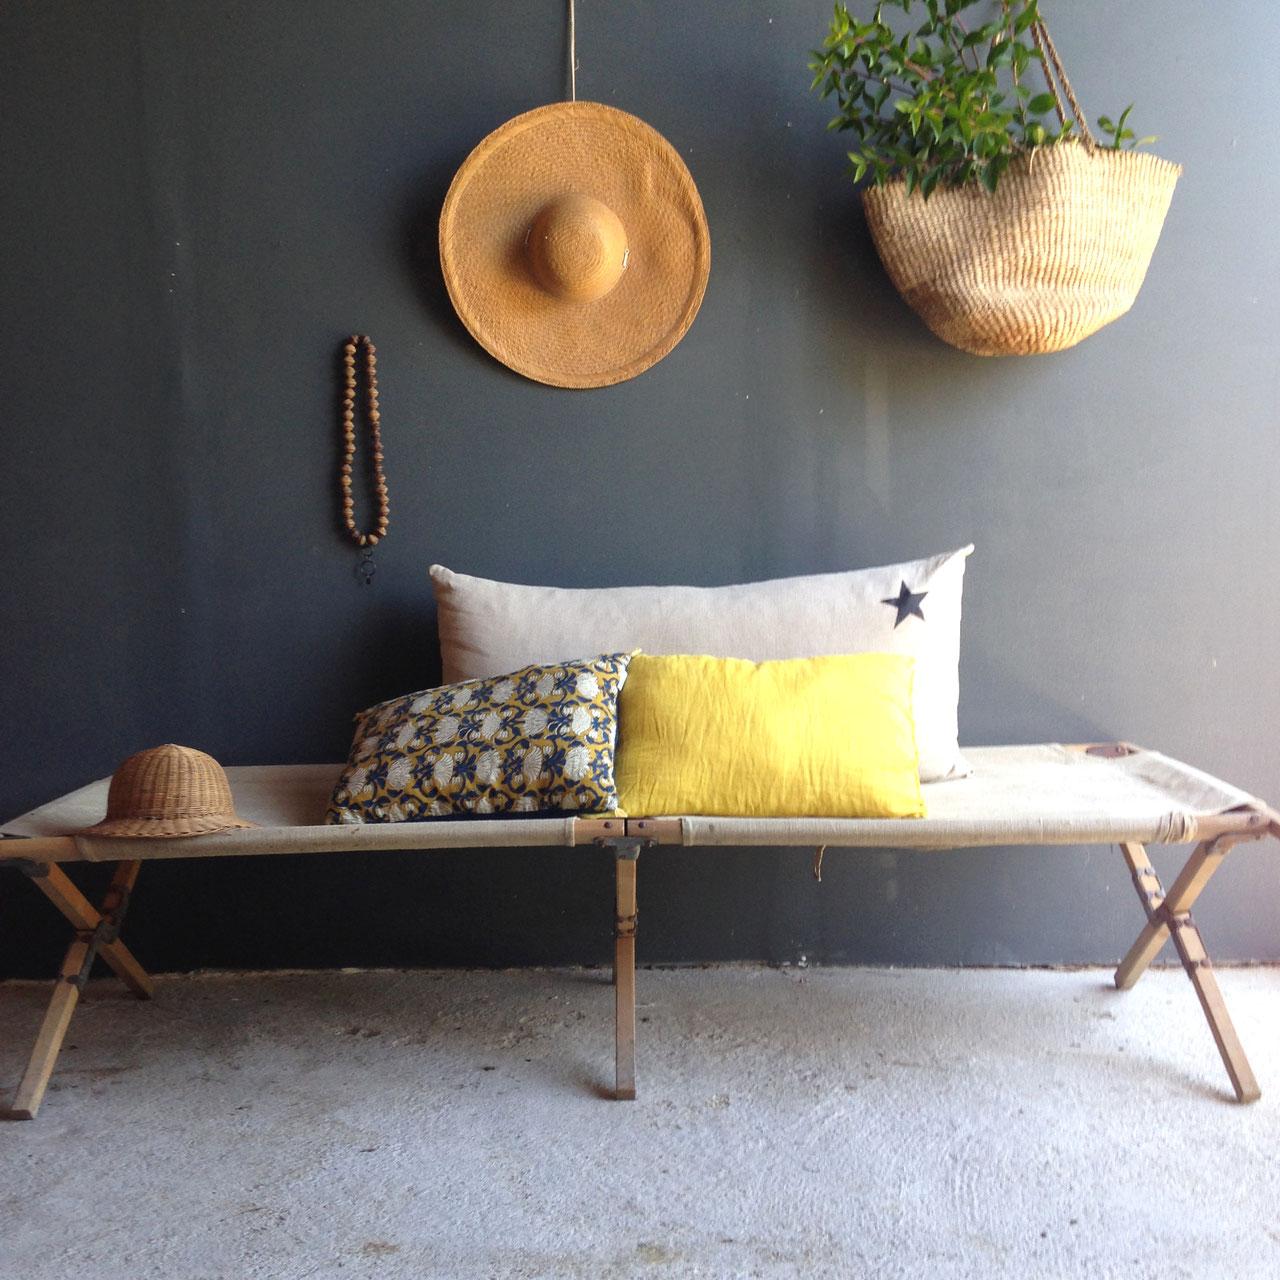 Objet design cadeau tendance luminaire mobilier et mobilier jardin vintage - Mobilier jardin vintage rennes ...